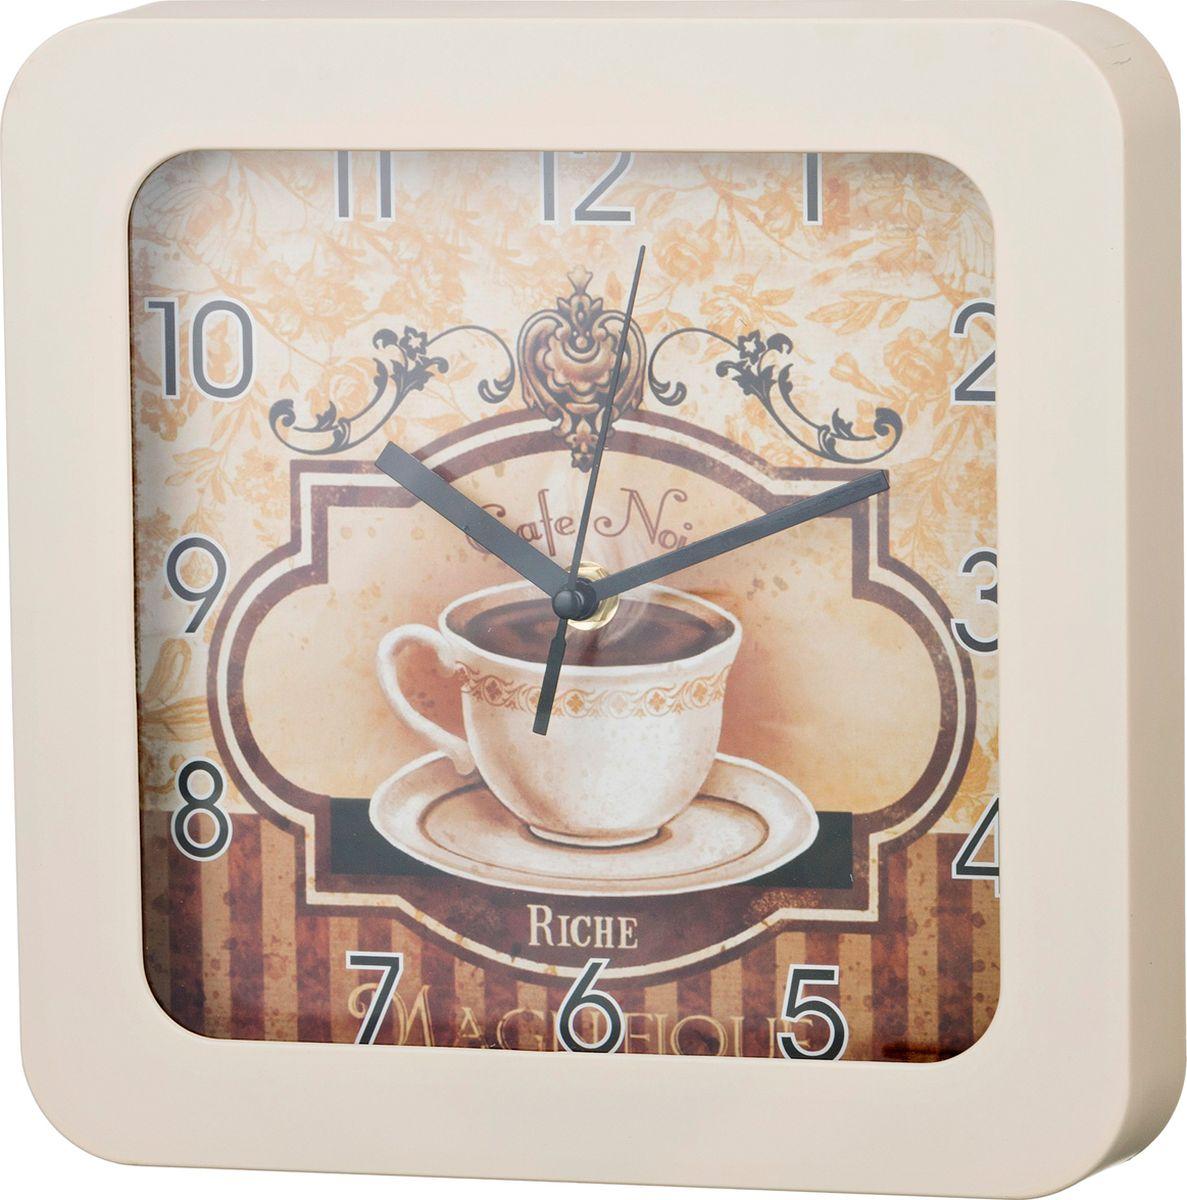 Настенные часы Lefard Chef Kitchen, кварцевые, 23 х 4 см